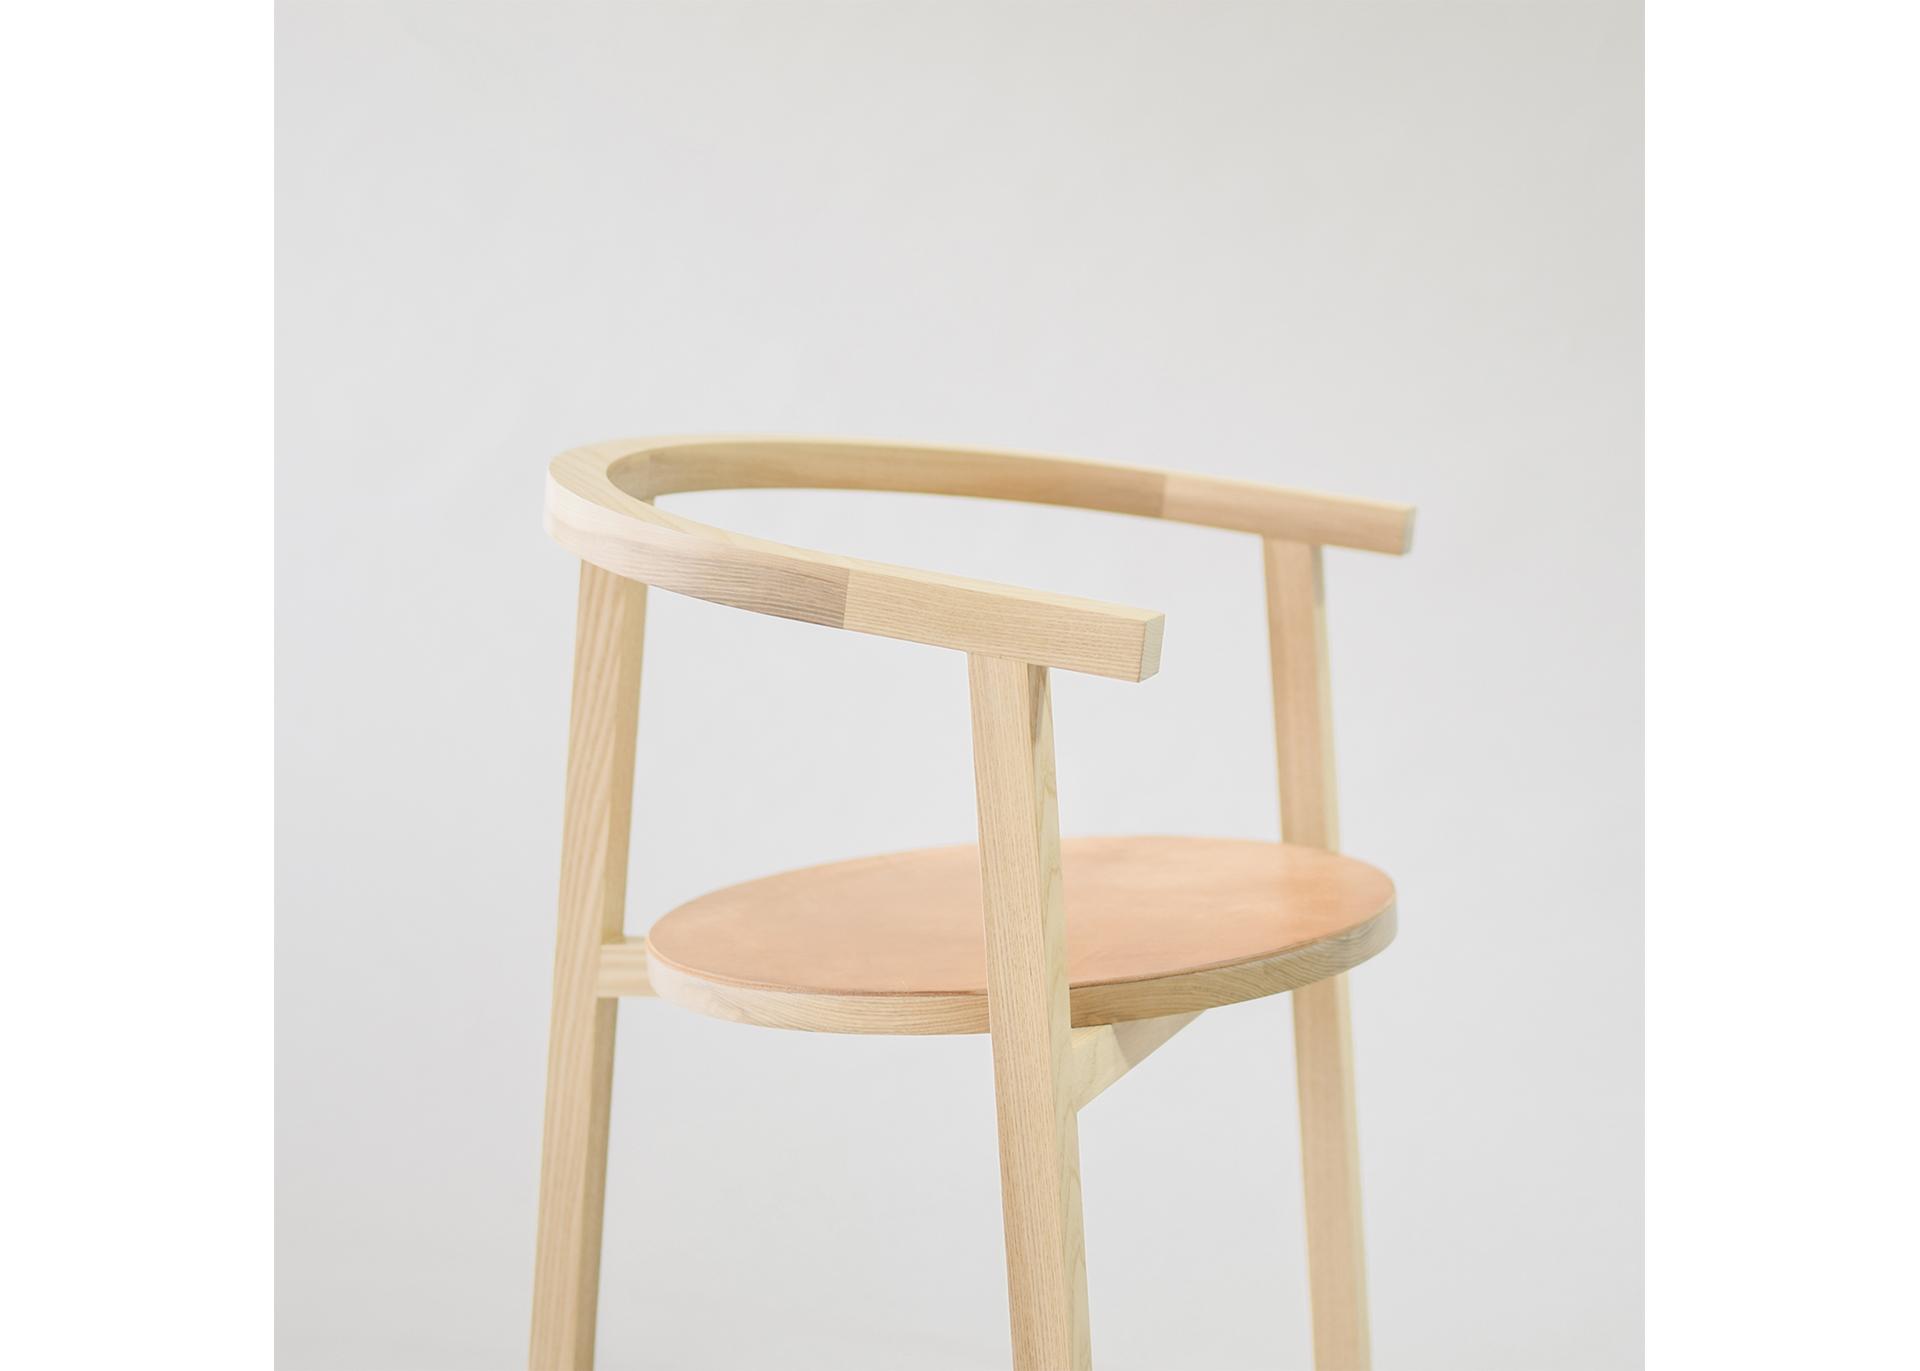 2 - ChairNo.1 WEB.jpg